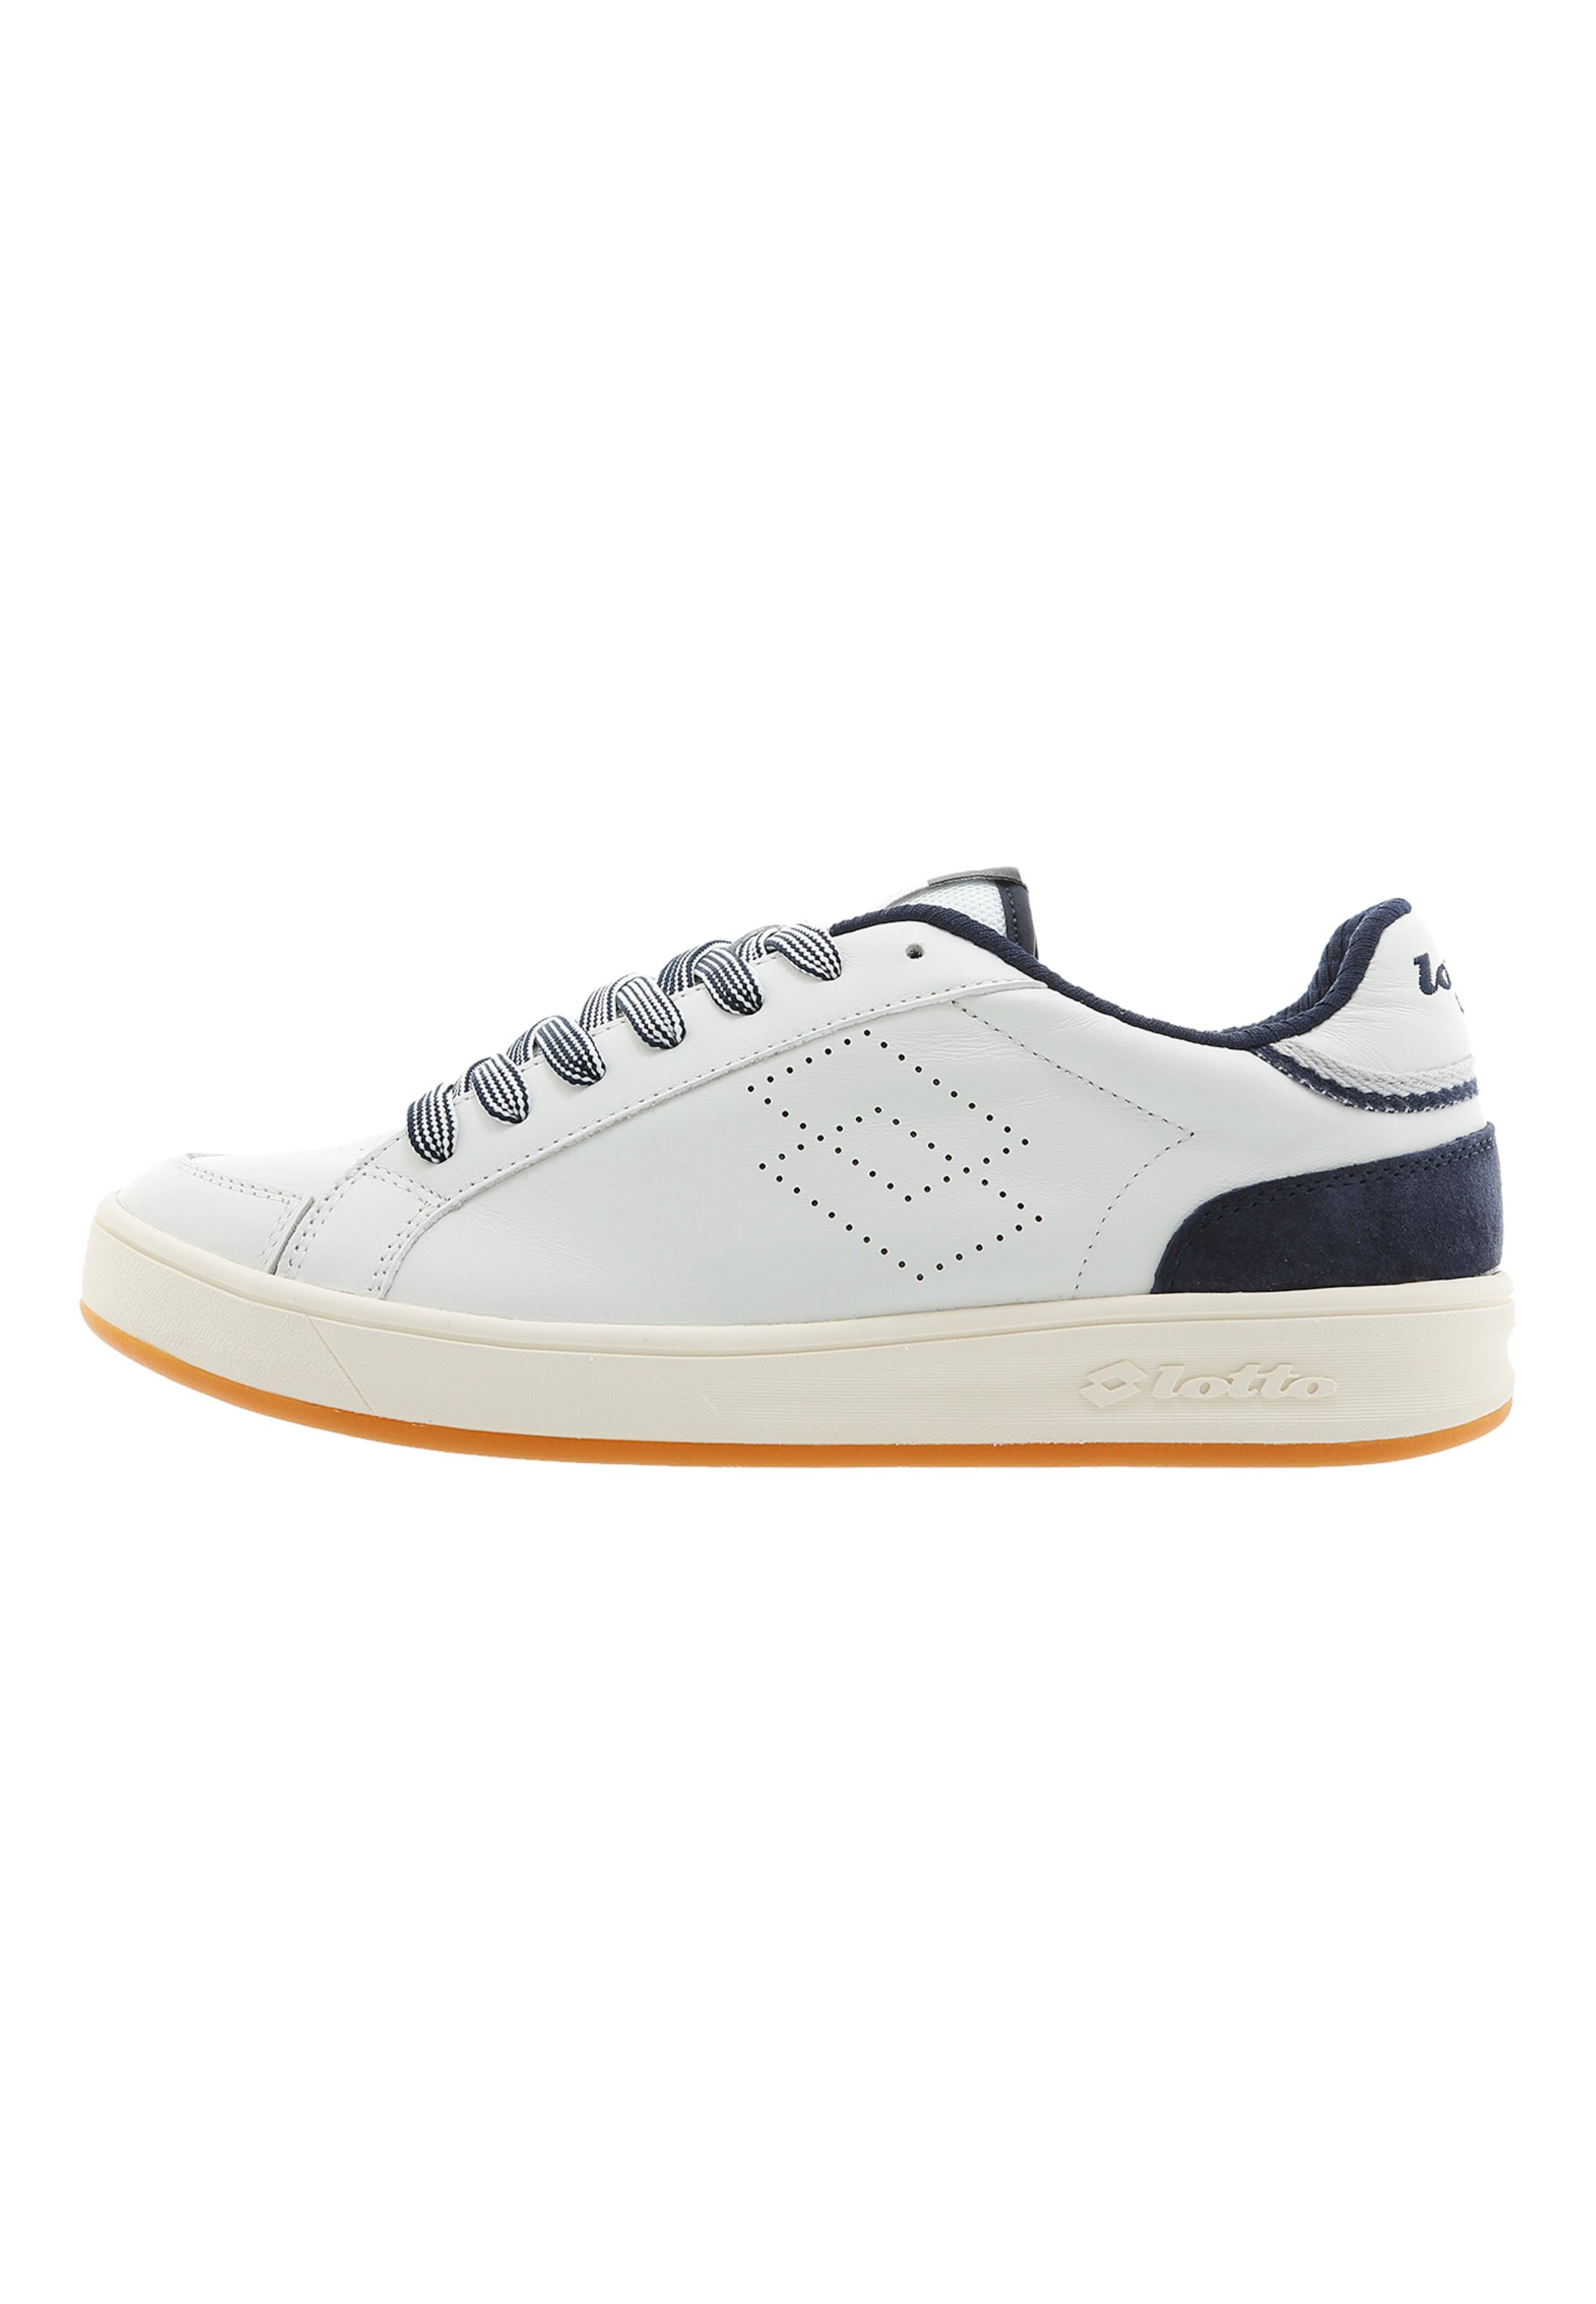 Leggenda Lotto In Signature' 'pro NavyWeiß Sneaker vm0nywON8